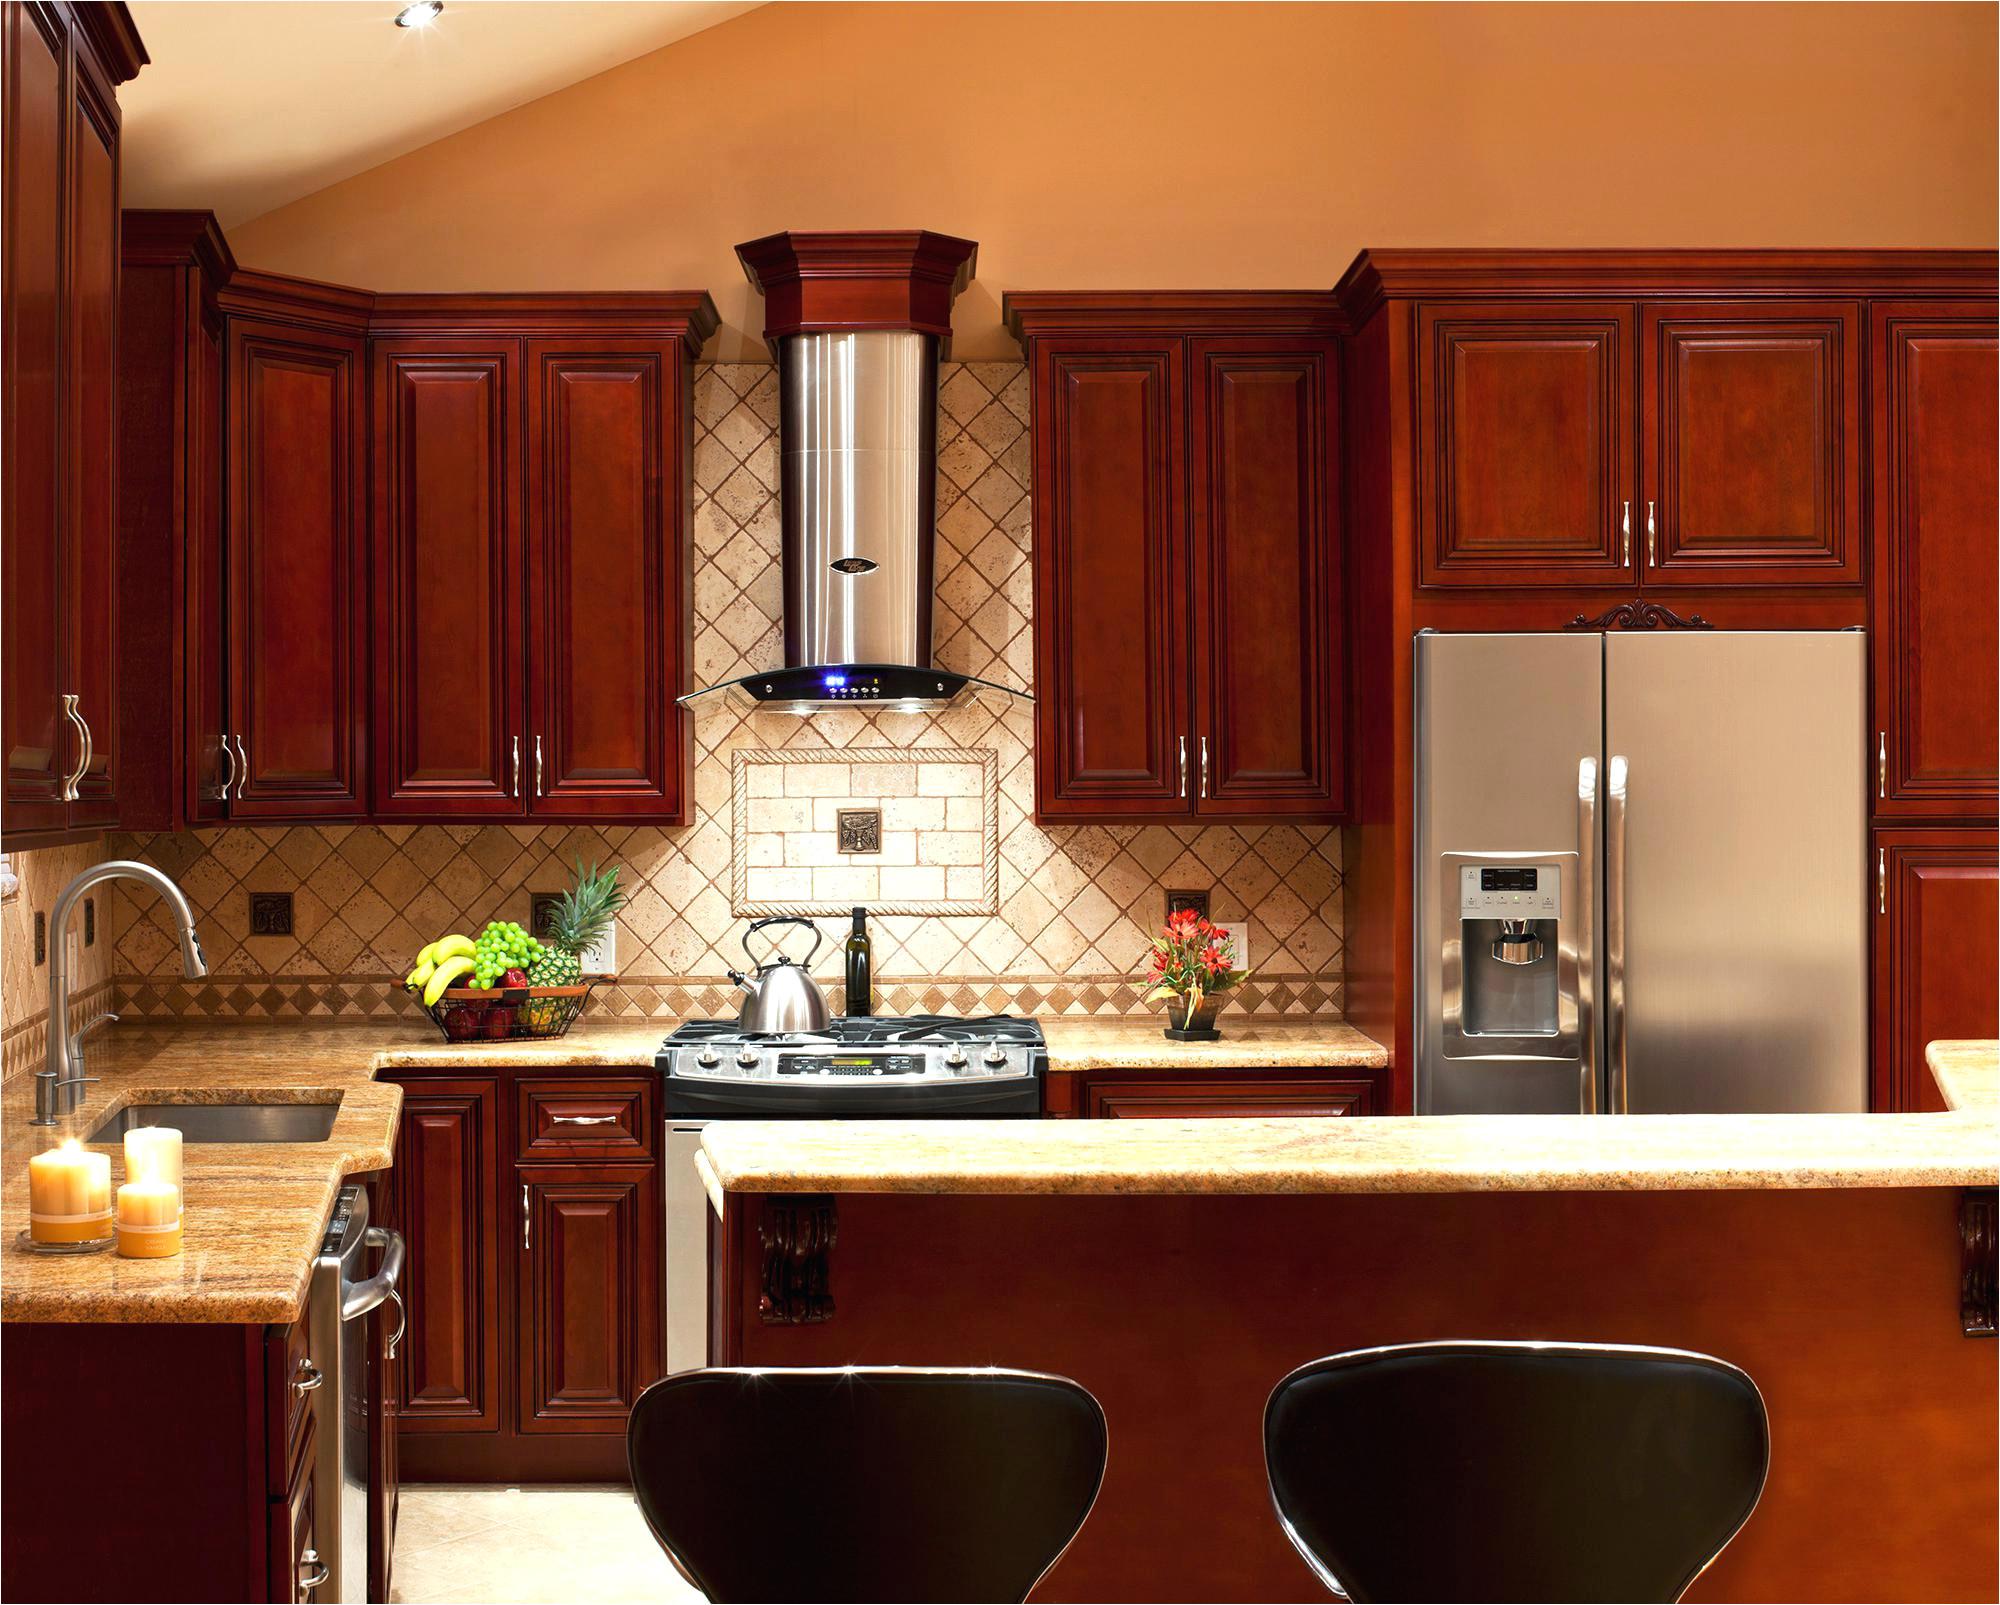 Used Restaurant Equipment Portland or Kitchen Cabinet ...